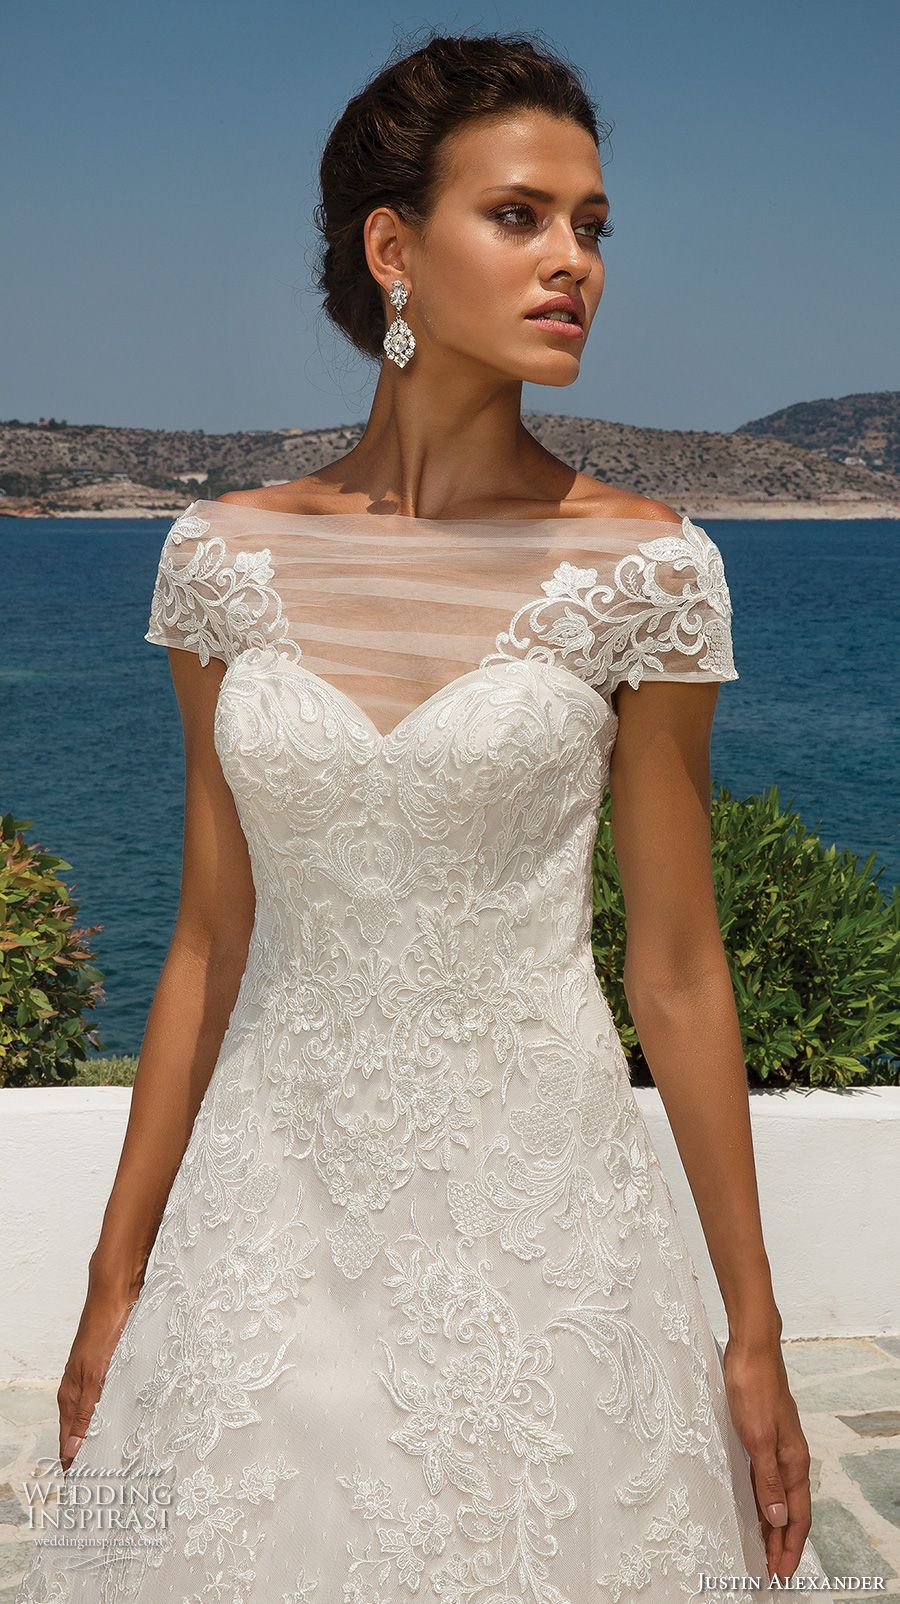 4adbf86e24f justin alexander 2018 bridal cap sleeves illusion bateau sweetheart  neckline full embellishment romantic a line wedding dress sheer button back  chapel train ...